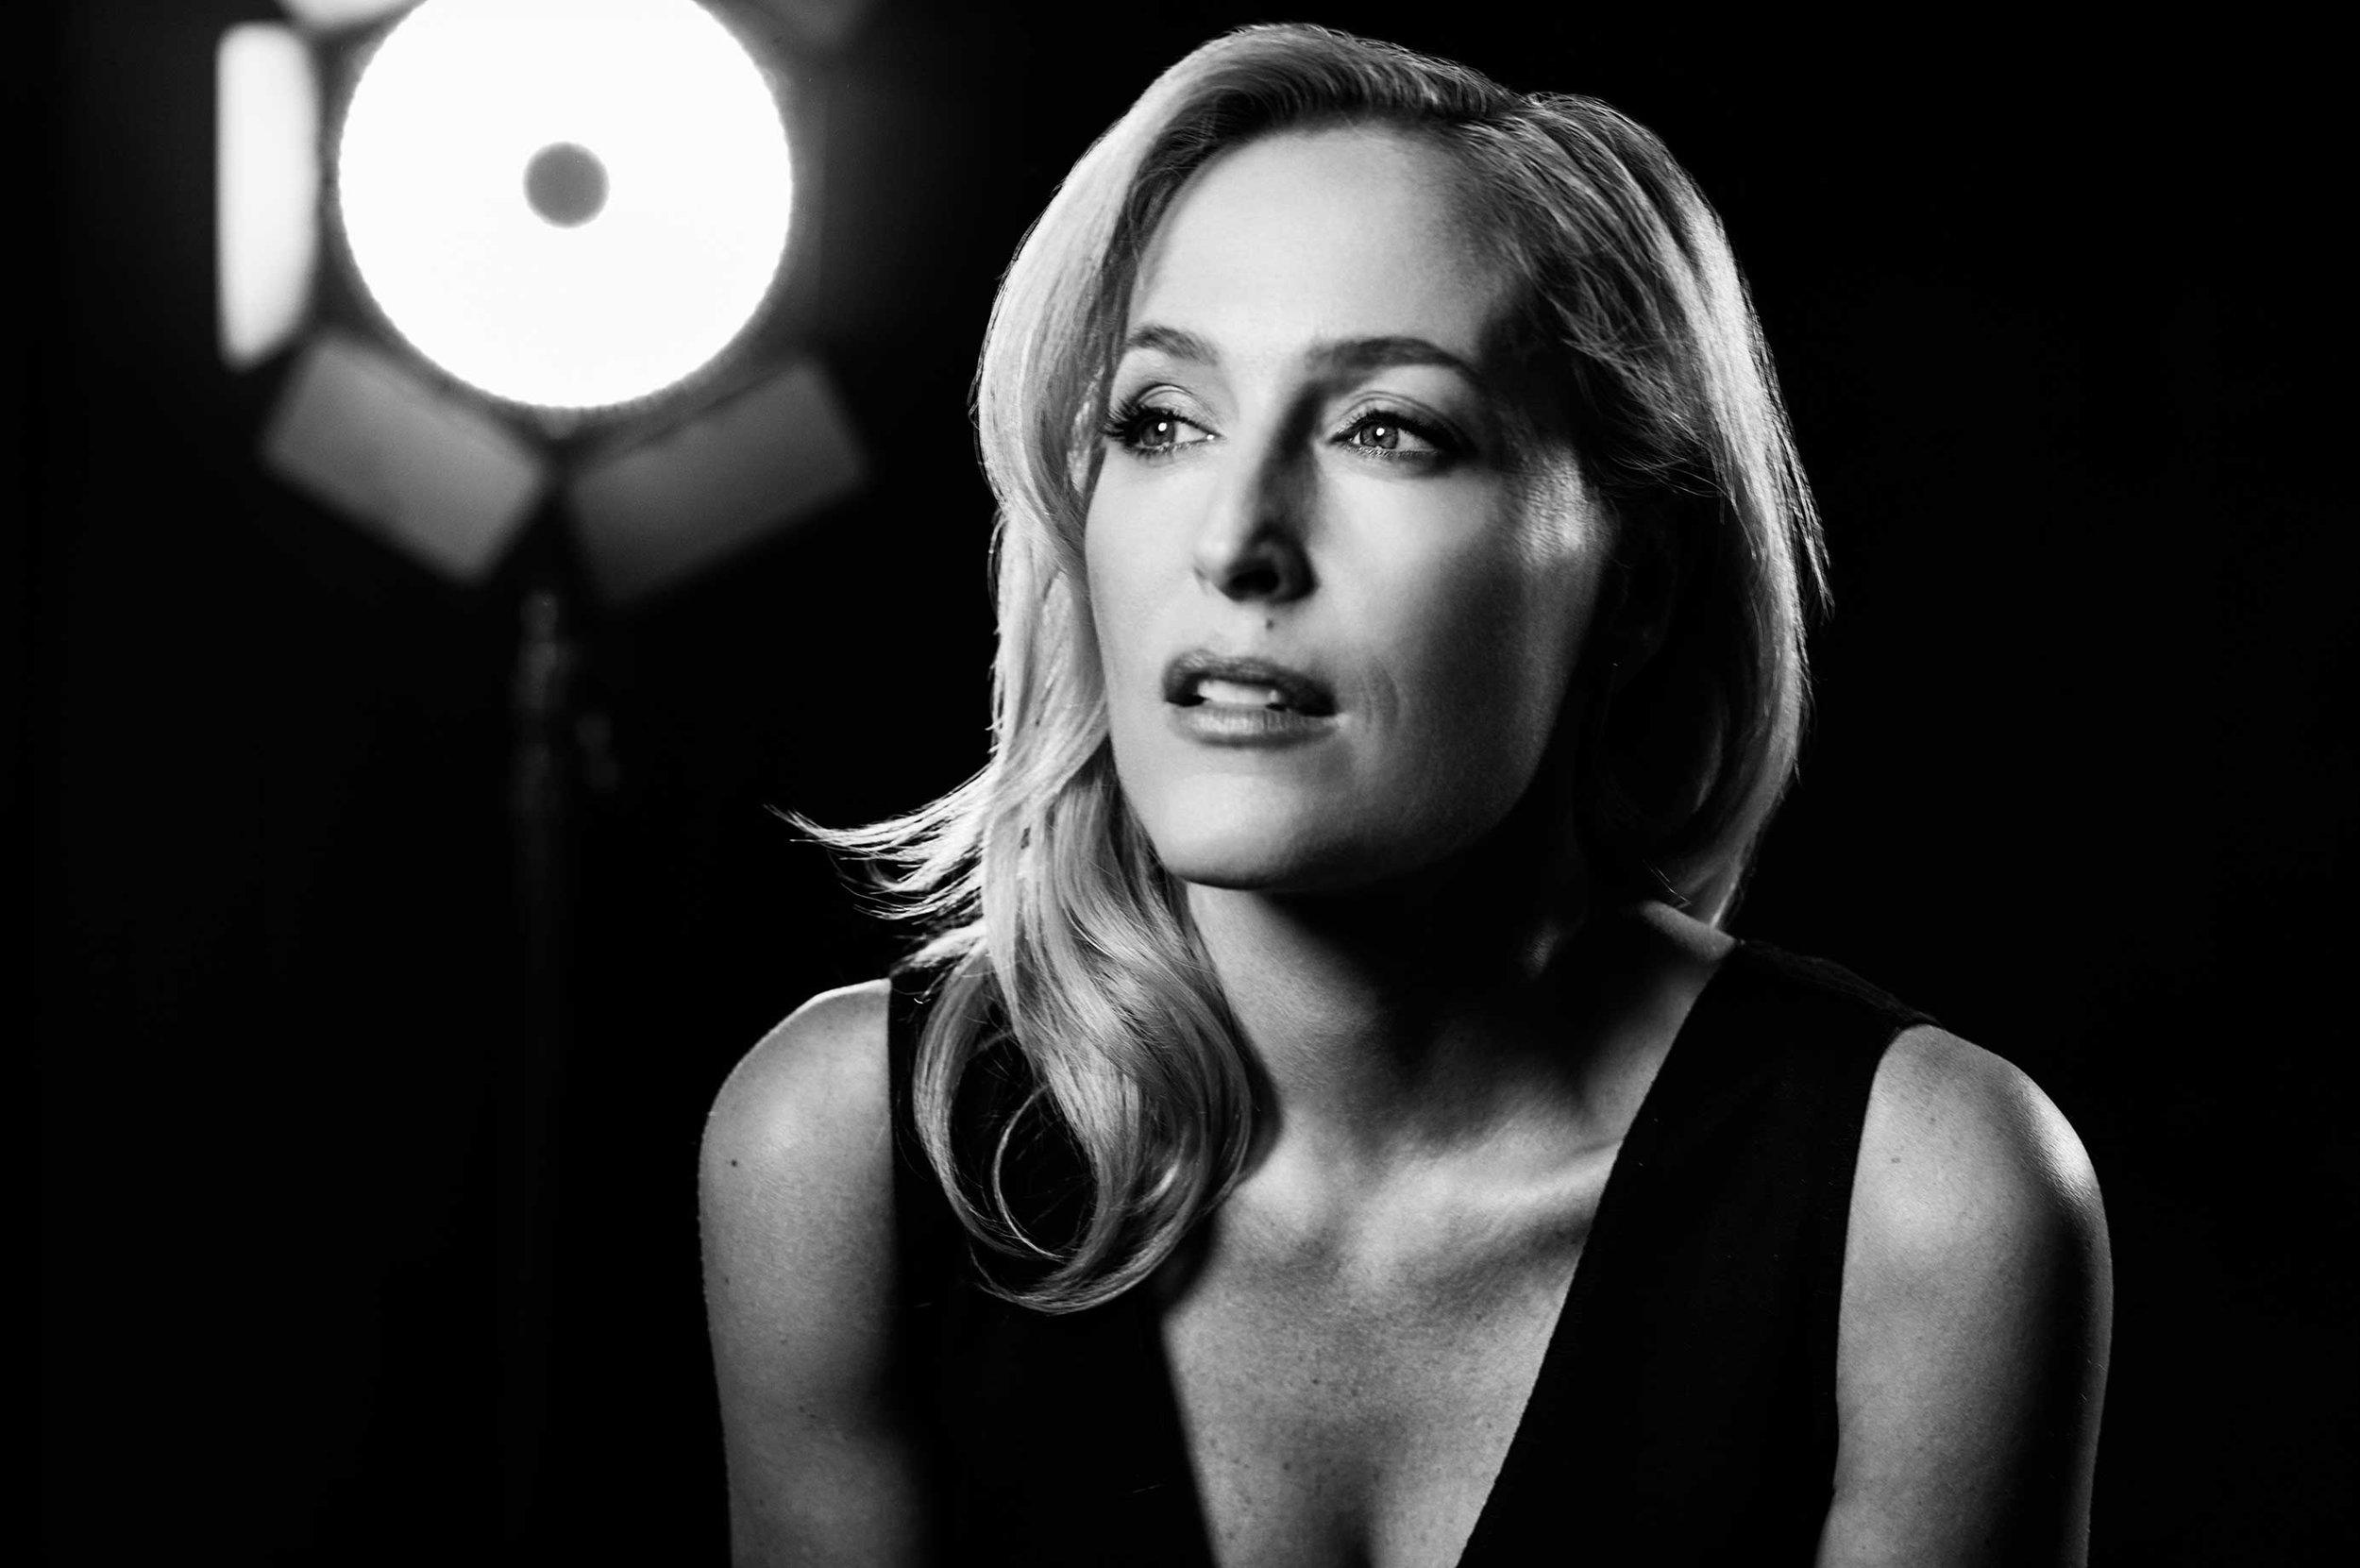 Gillian-Anderson---X-Files-00007-1.jpg